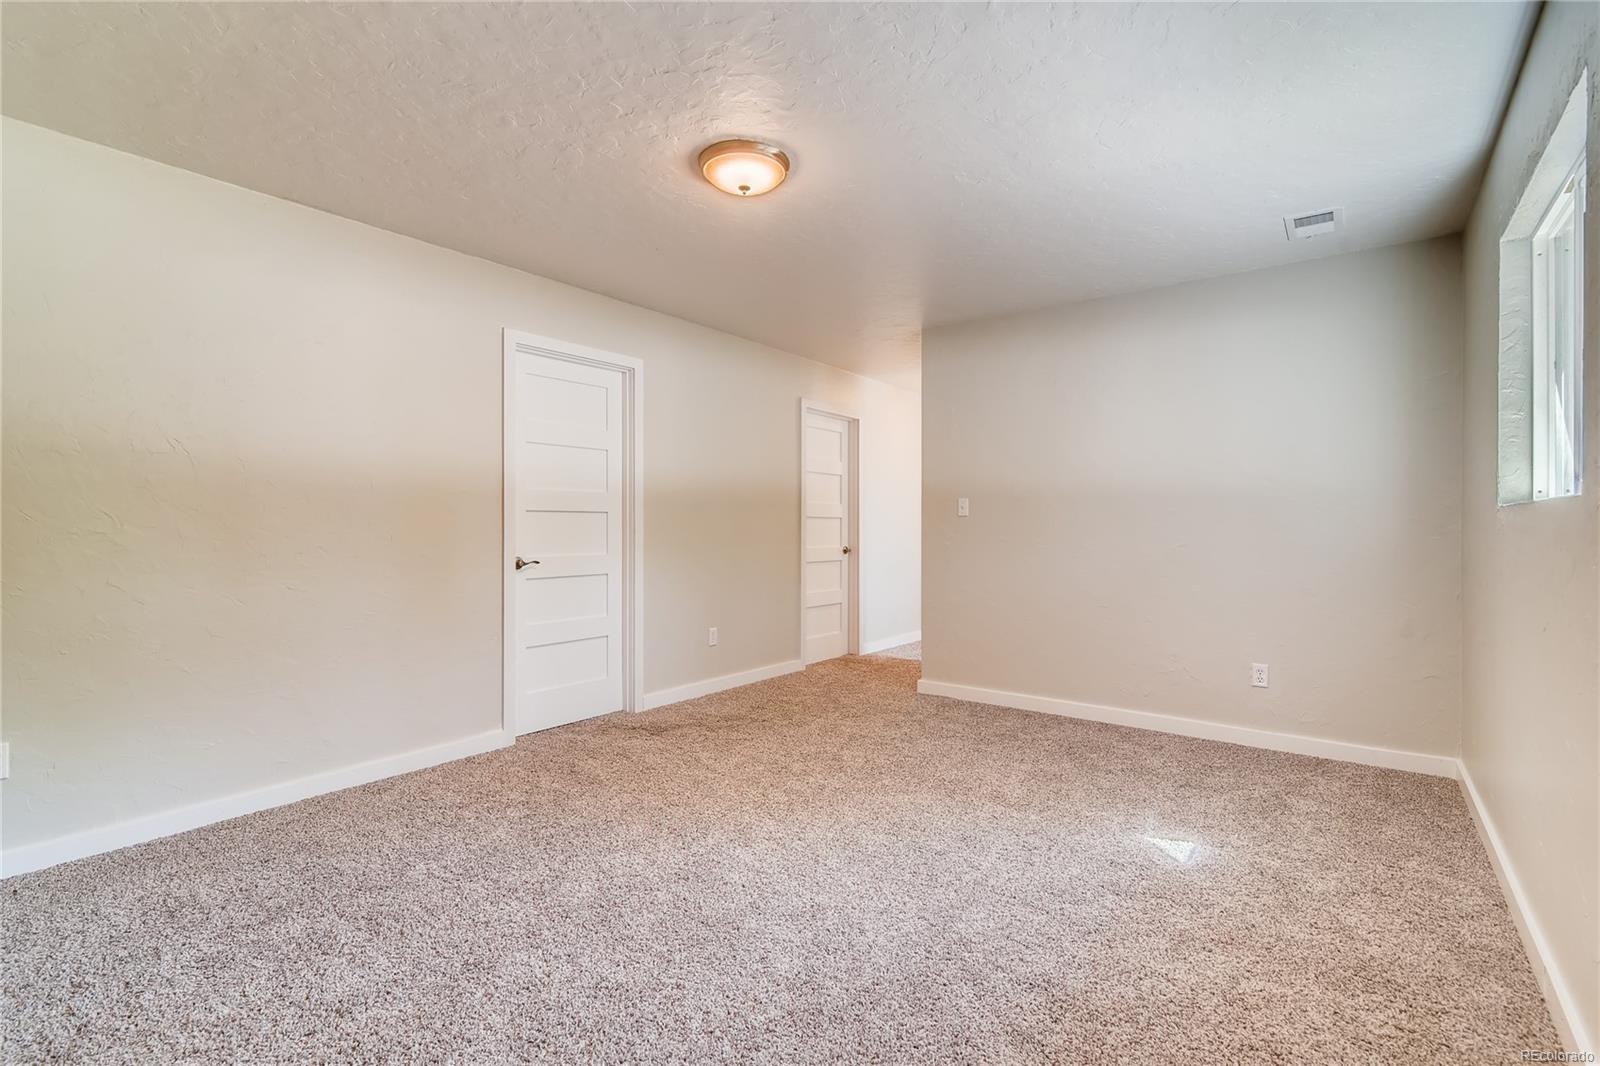 MLS# 2893134 - 1 - 700  Duke Square, Fort Collins, CO 80525